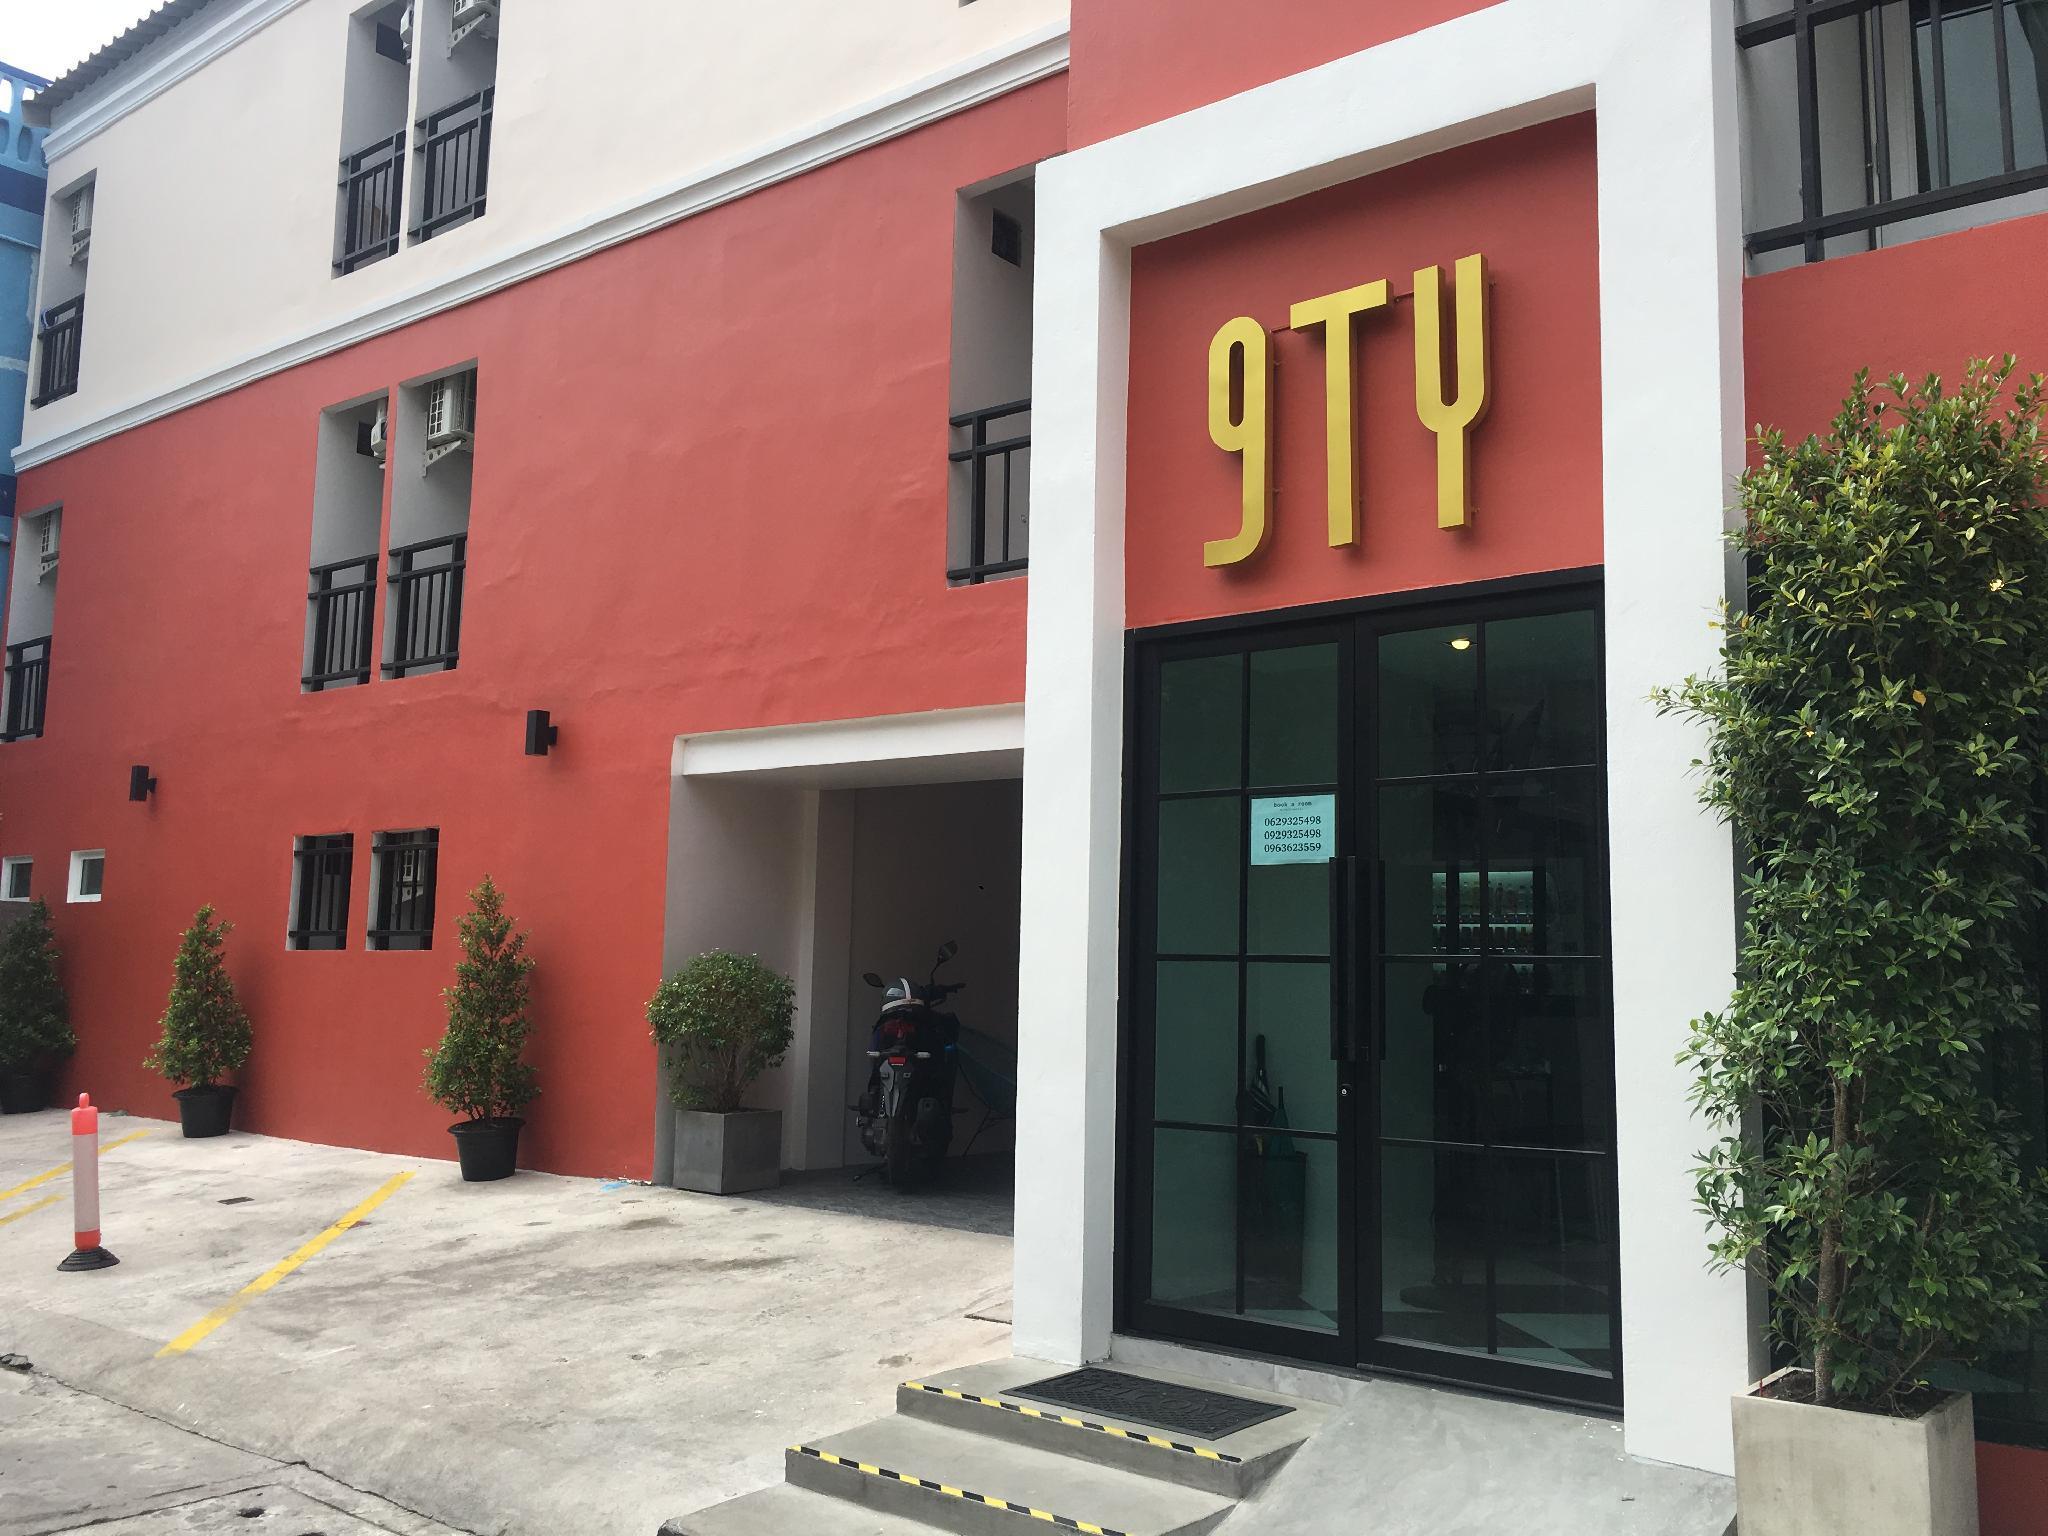 9TY Hotel